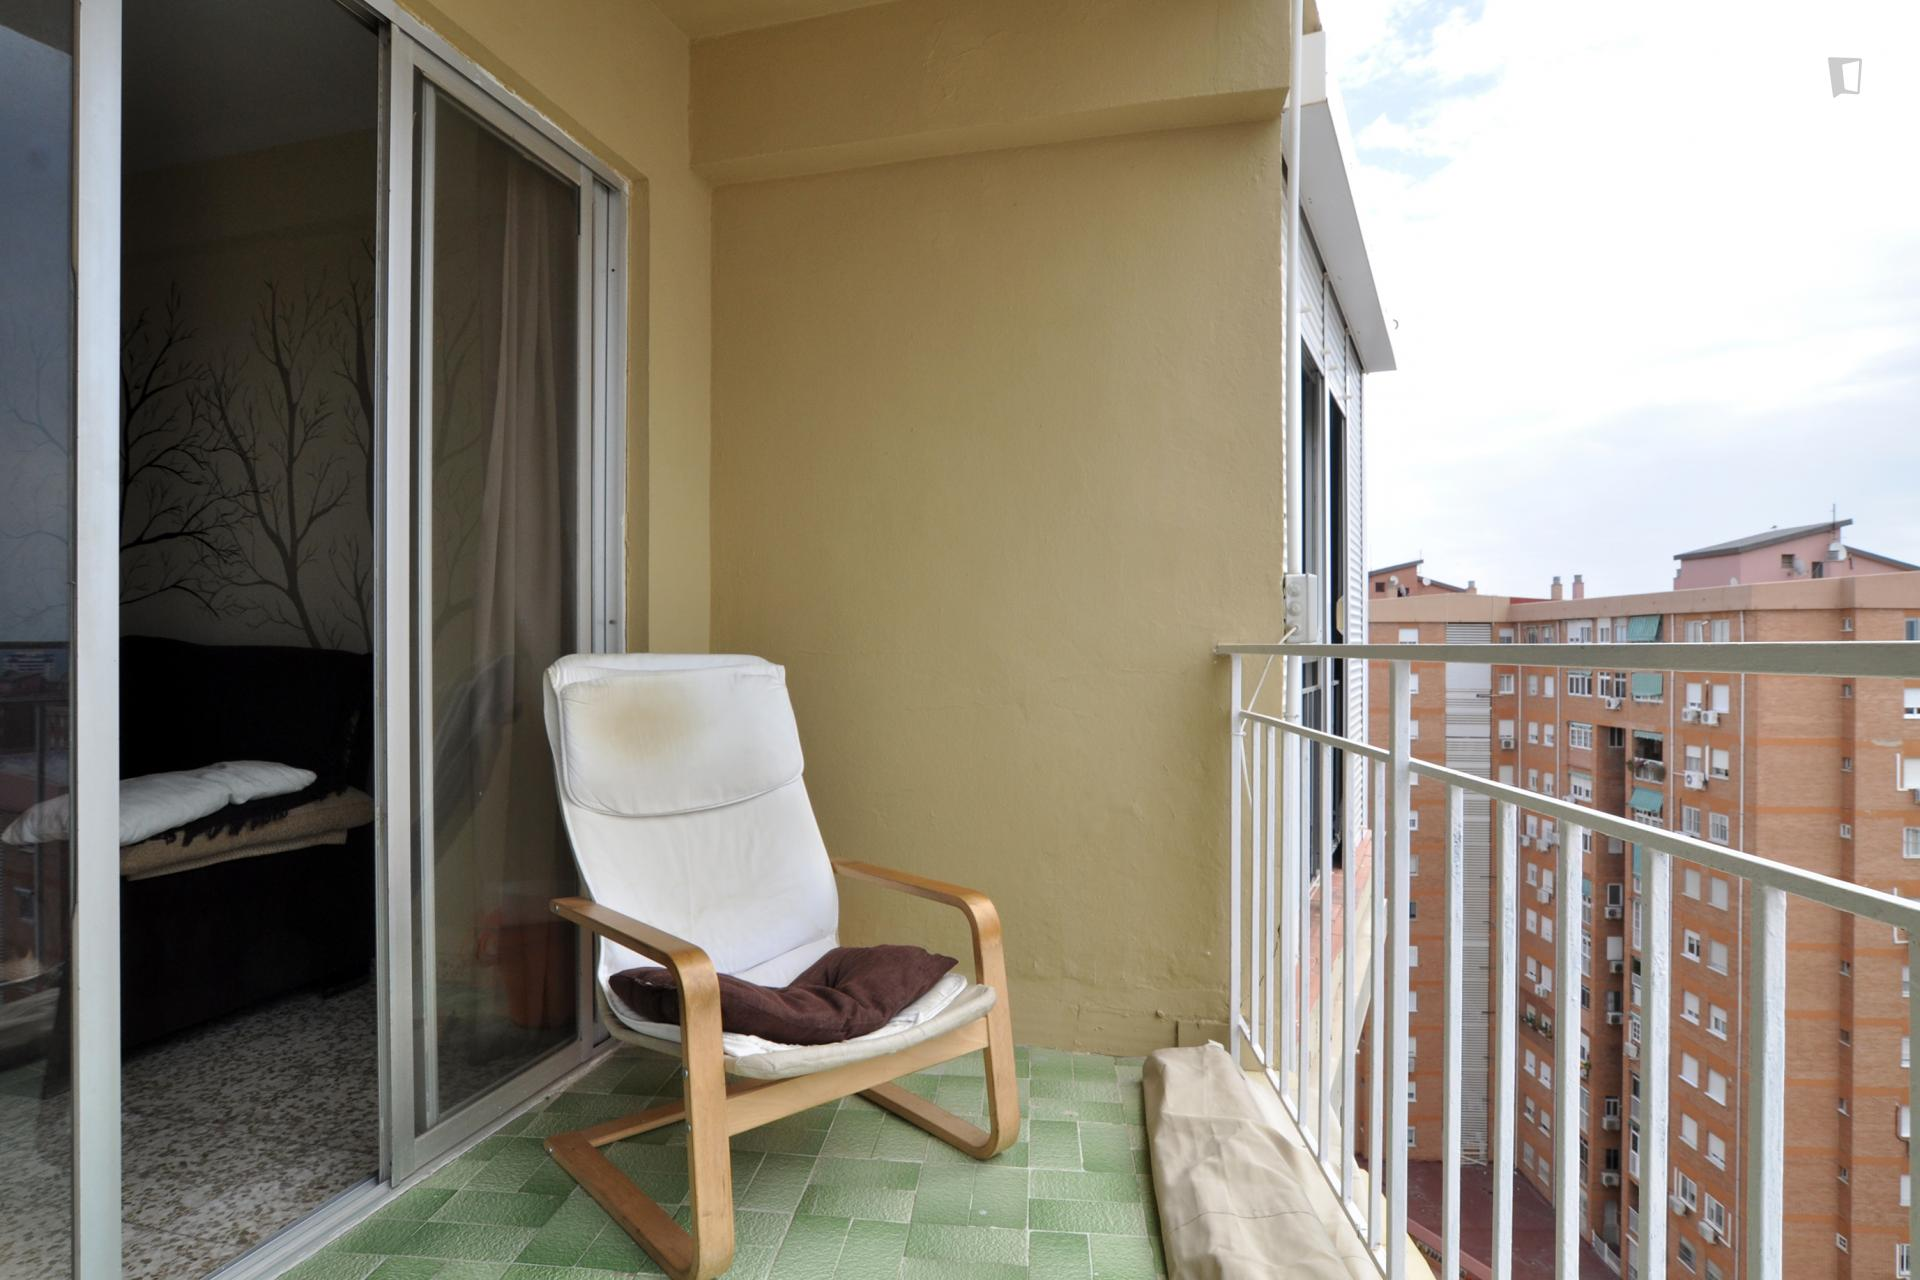 Europa- Student Flat in Malaga Near University